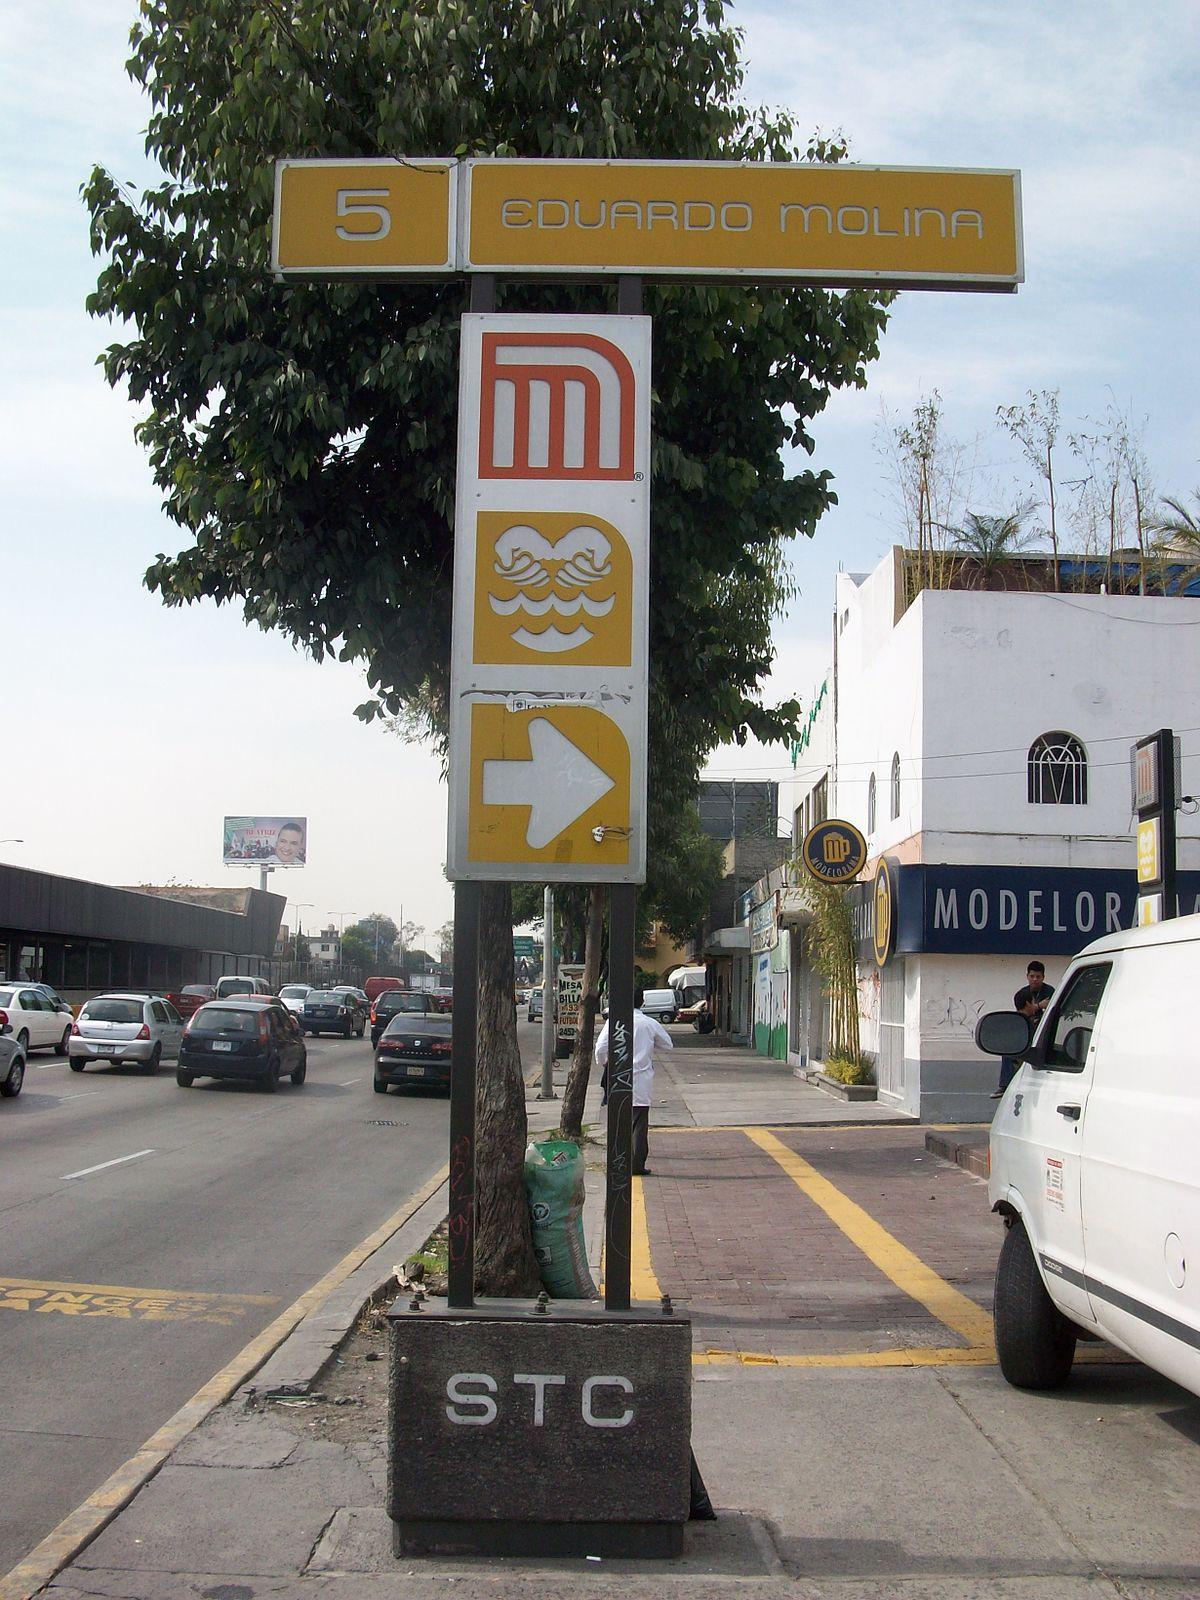 Circuito Y Eduardo Molina : Metro eduardo molina wikipedia